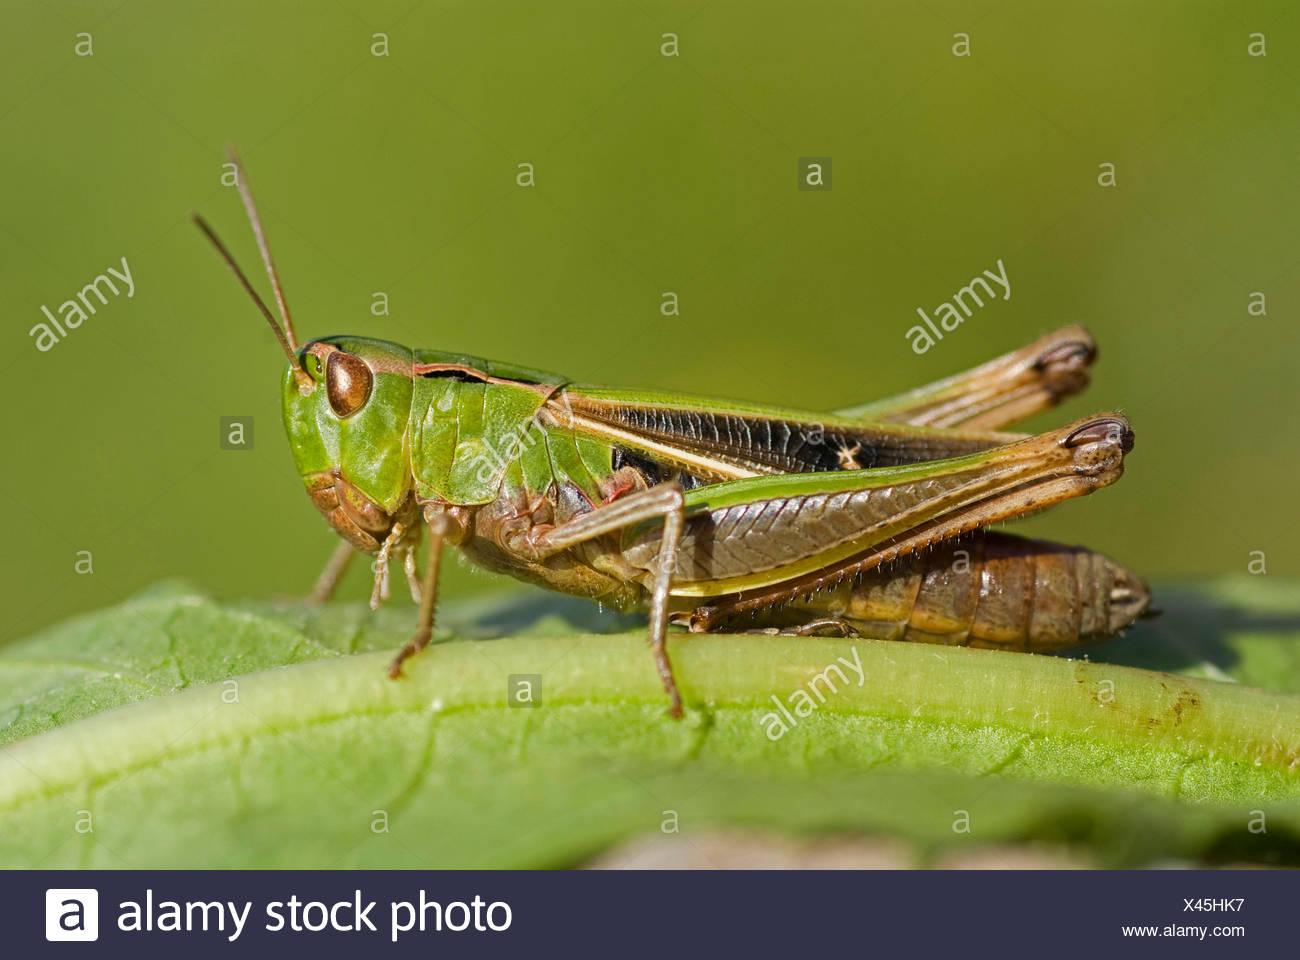 stripe-winged grasshopper, lined grasshopper (Stenobothrus lineatus), sitting on leaf, Germany - Stock Image